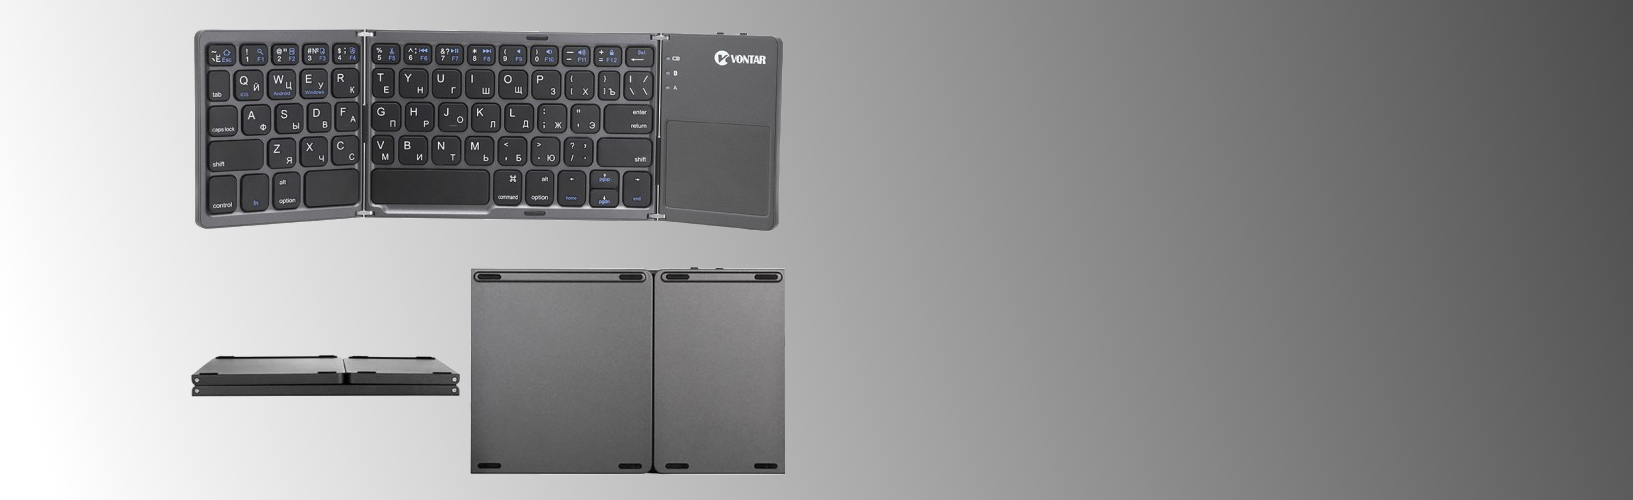 Складная Bluetooth клавиатура Vontar BT-033